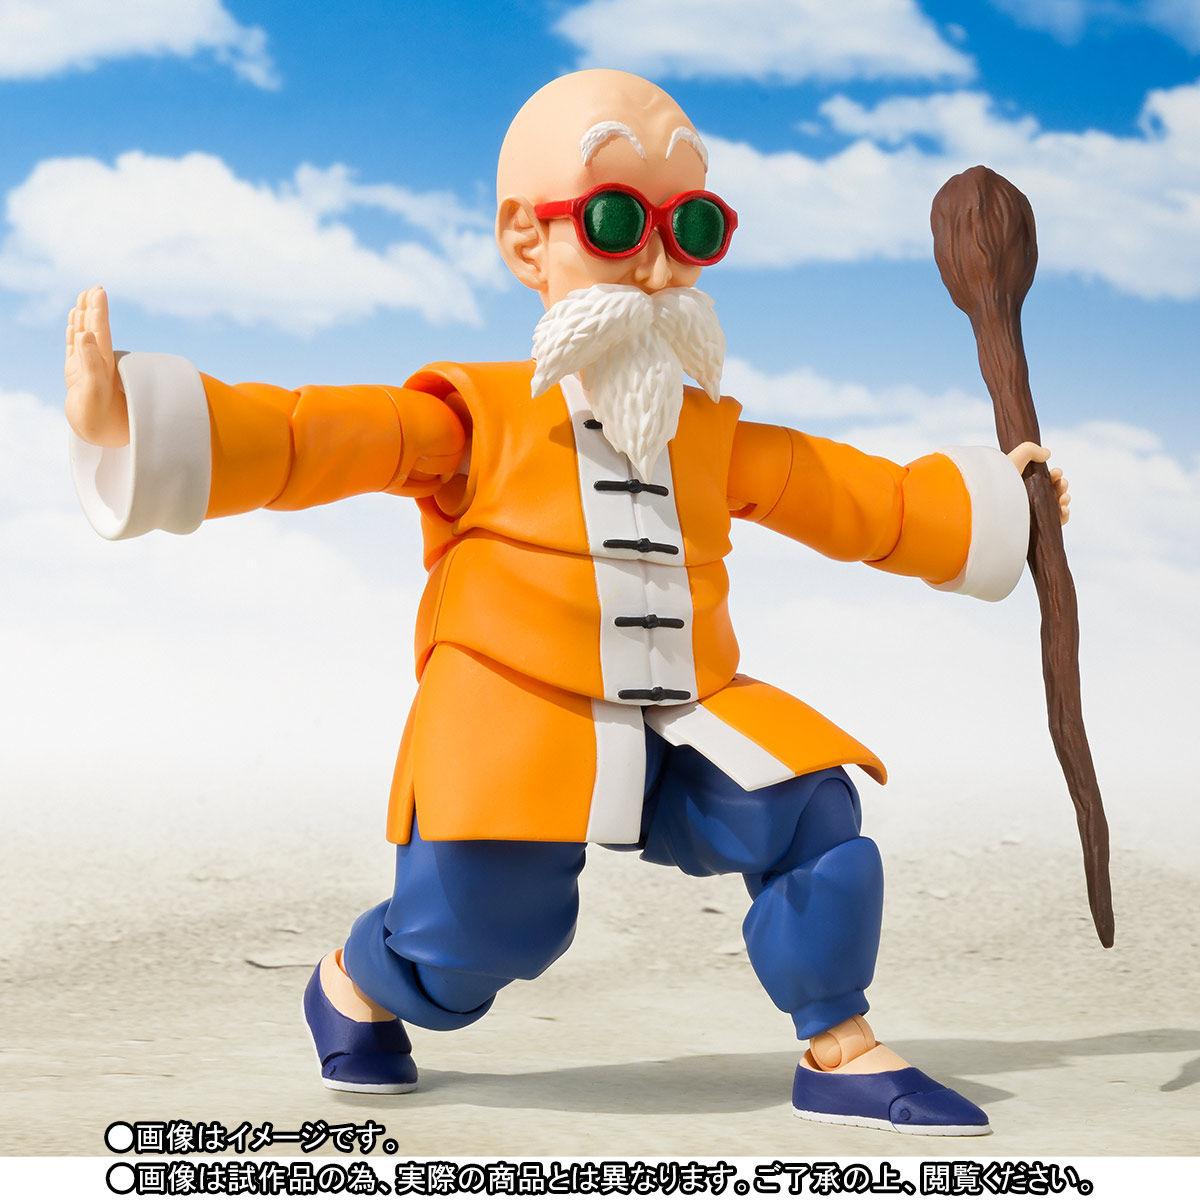 S.H. Figuarts Dragon Ball Z Master Roshi Figure